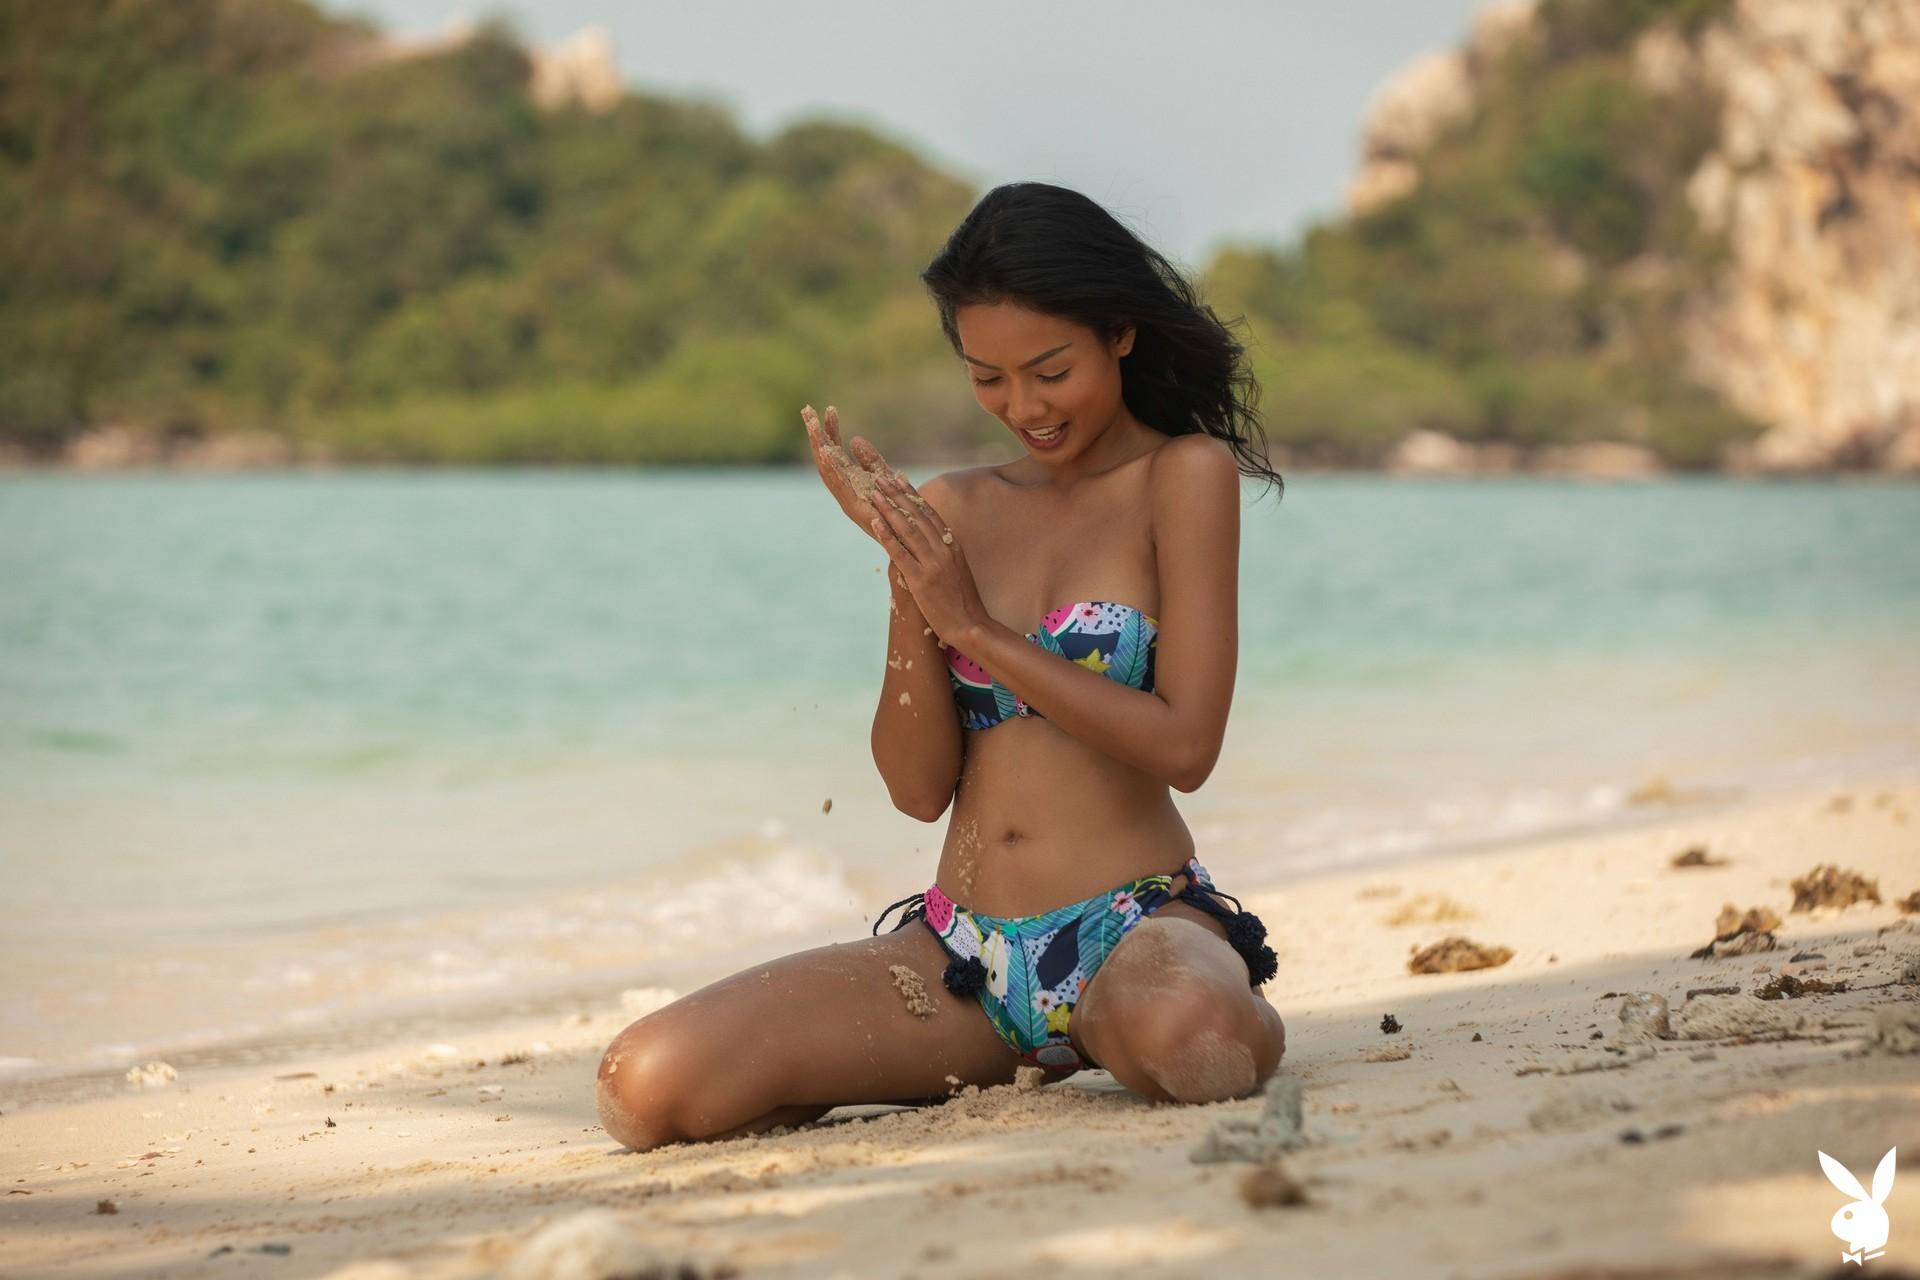 Magen Hana In Island Mentality Playboy Plus (3)